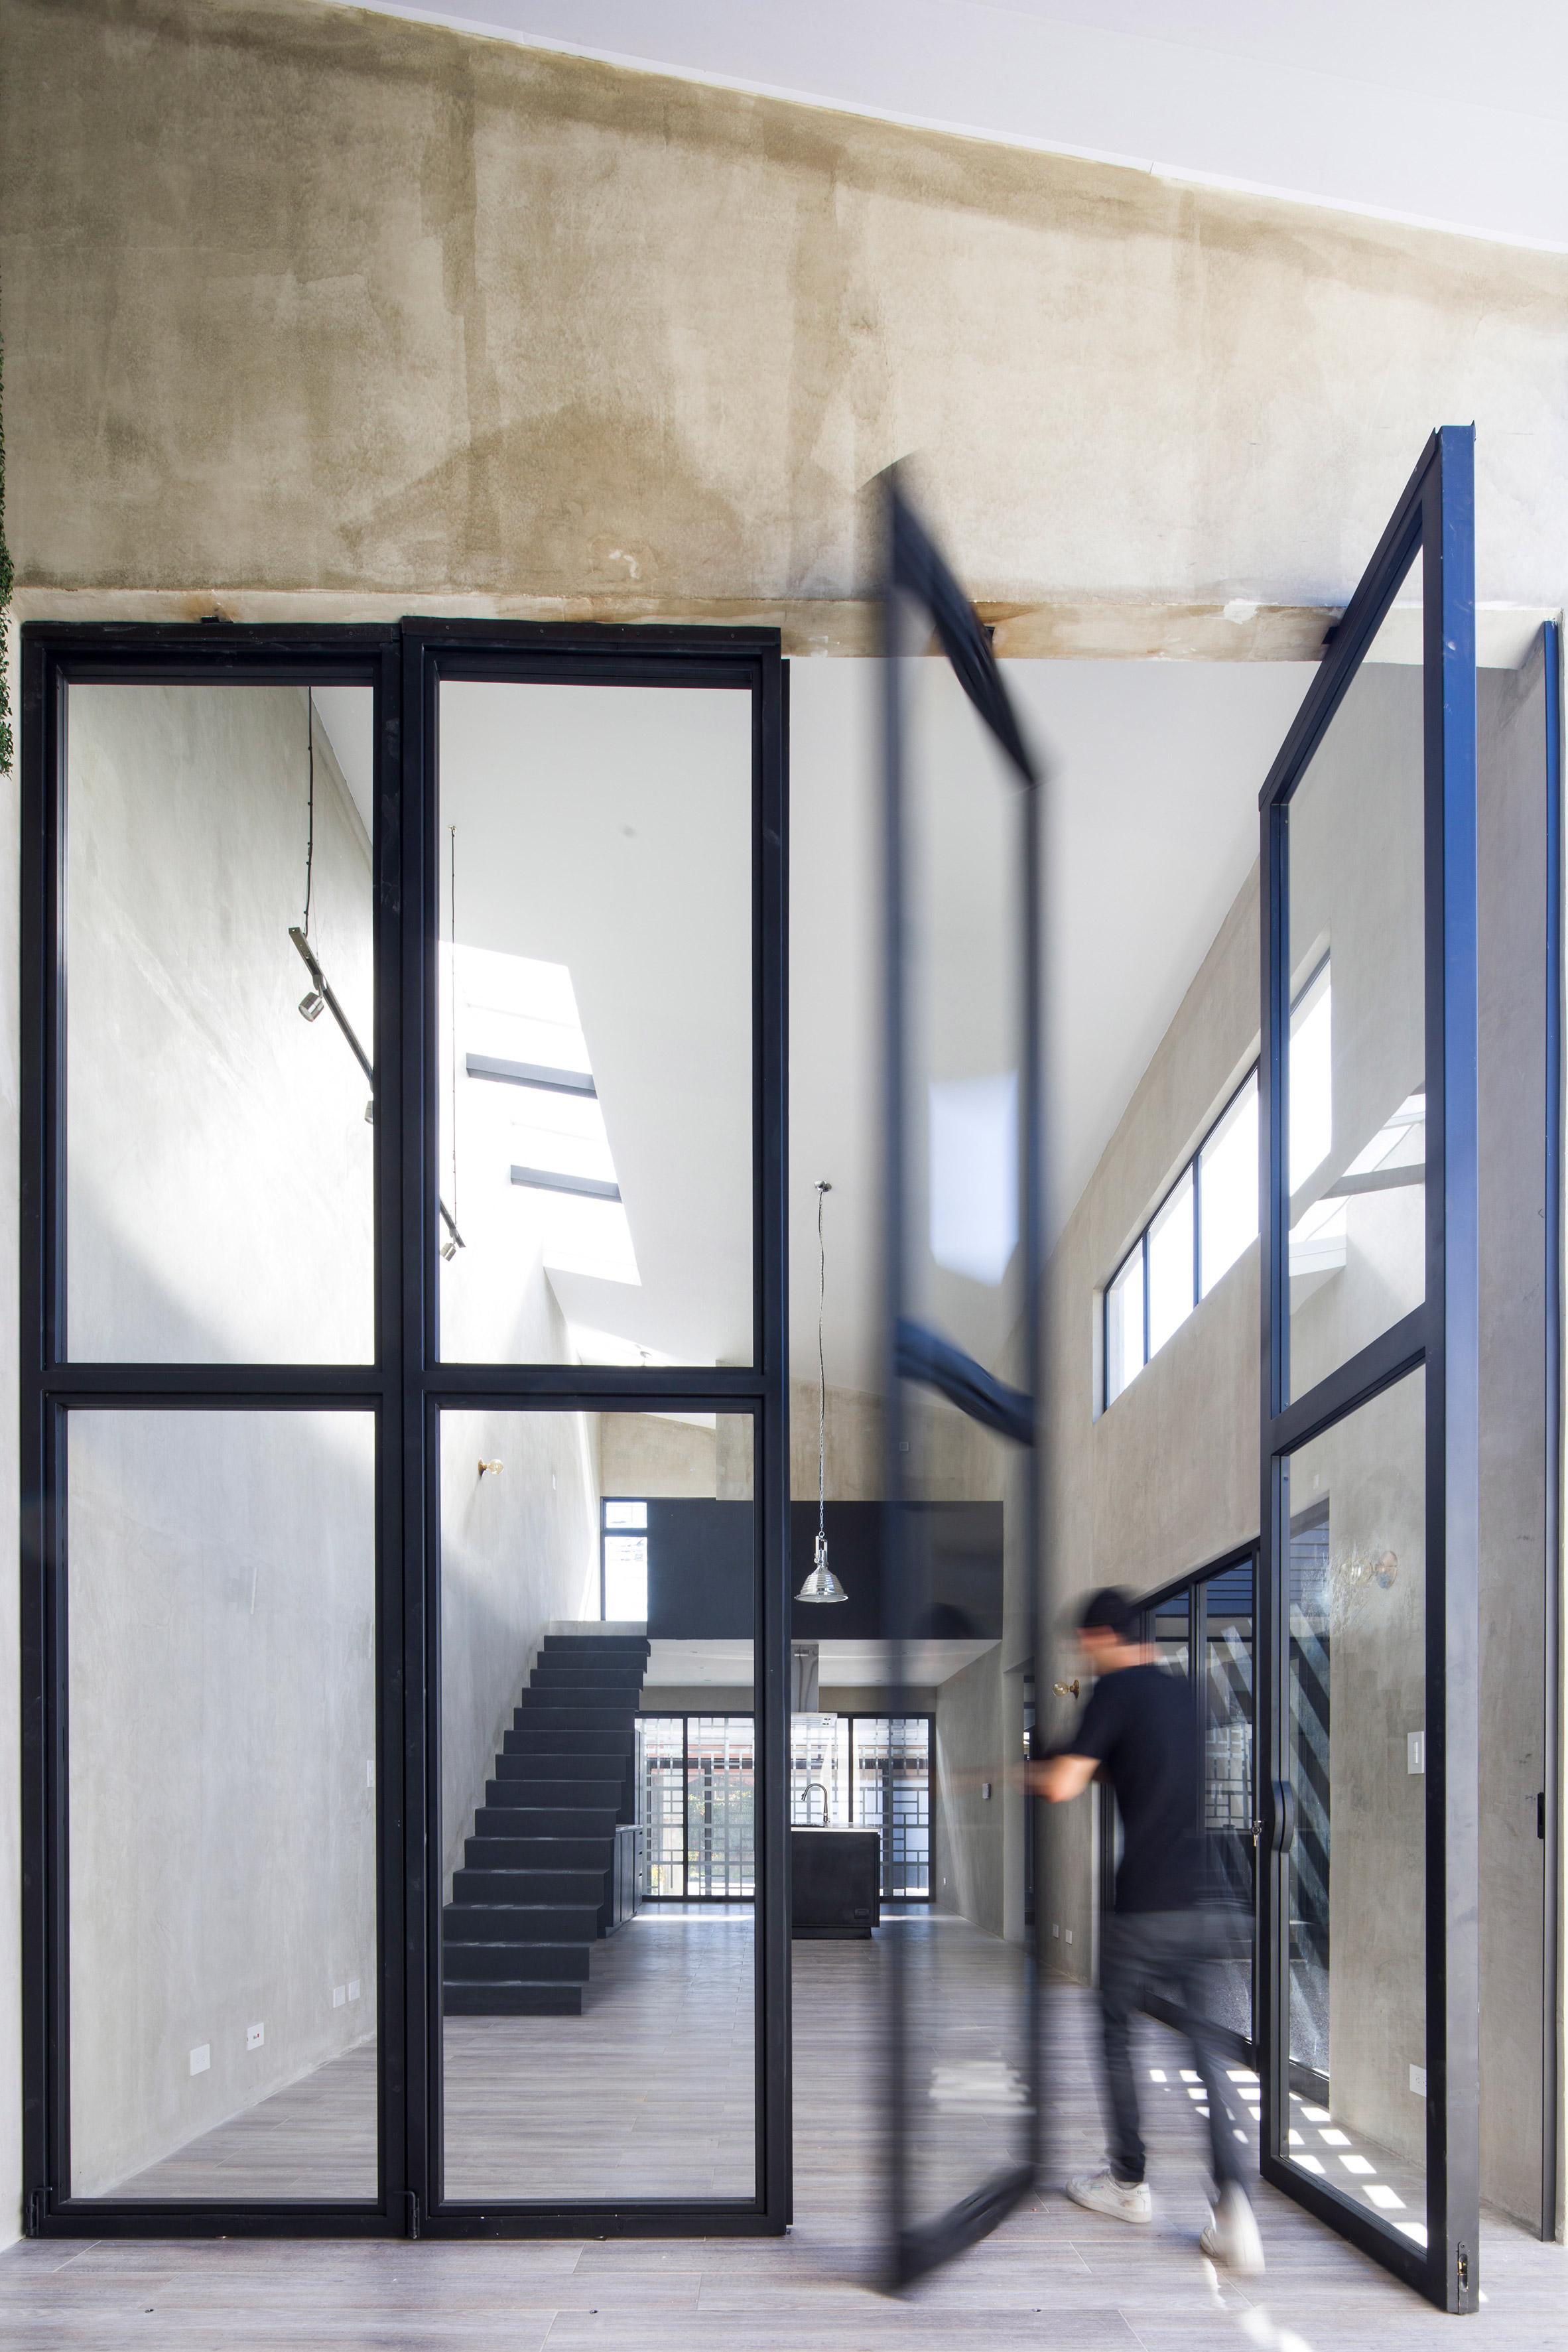 Casa Ching by MG Design Studio